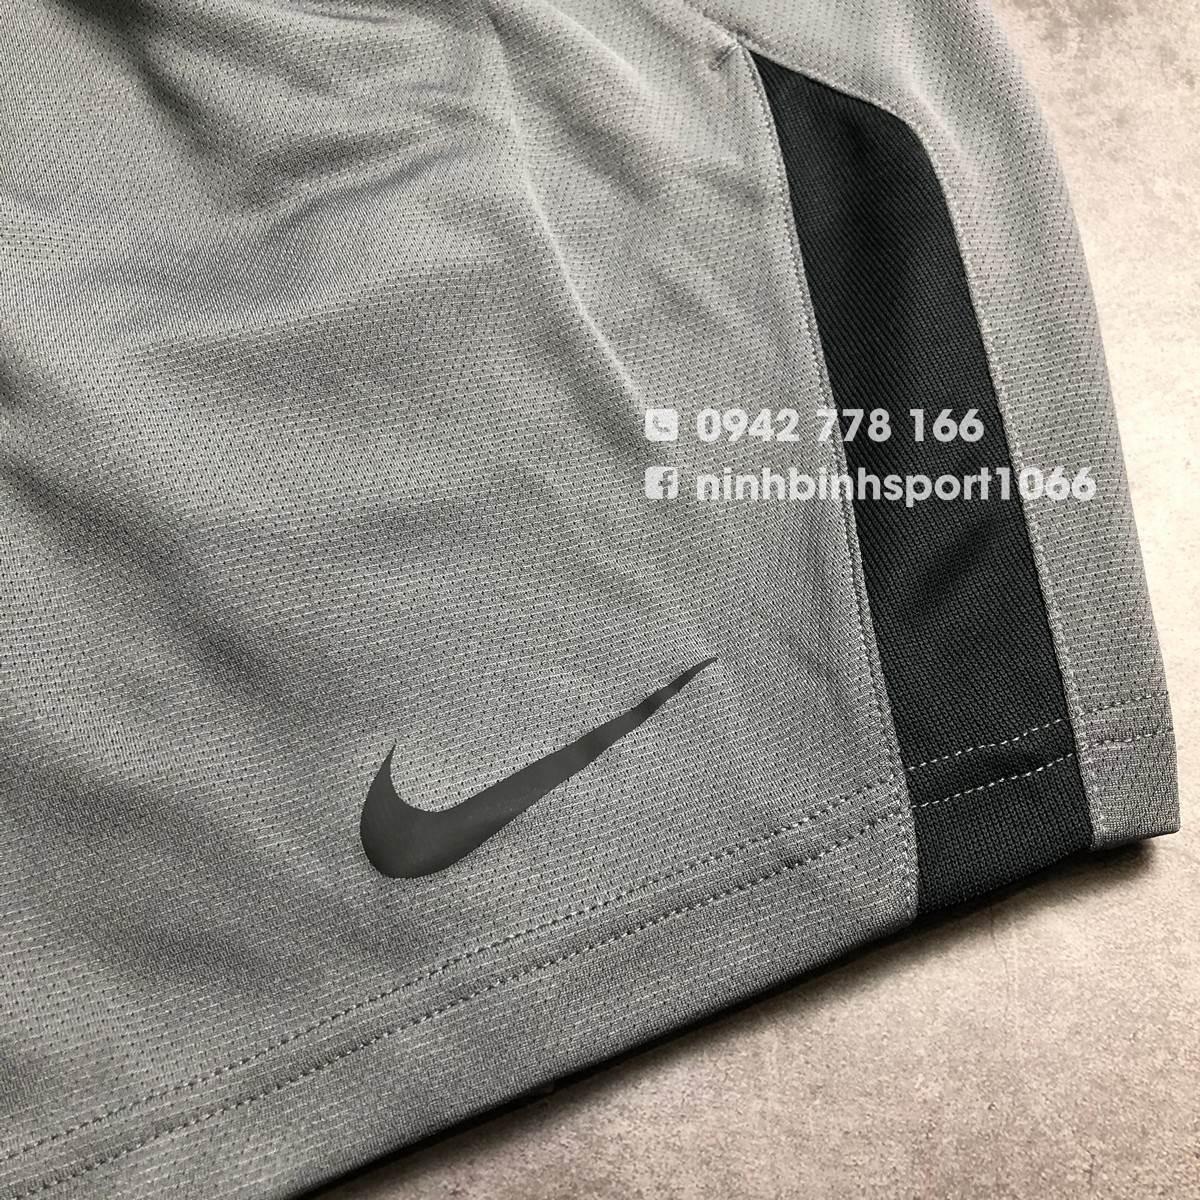 Quần short thể thao nam Nike Dri-FIT CJ2008-068